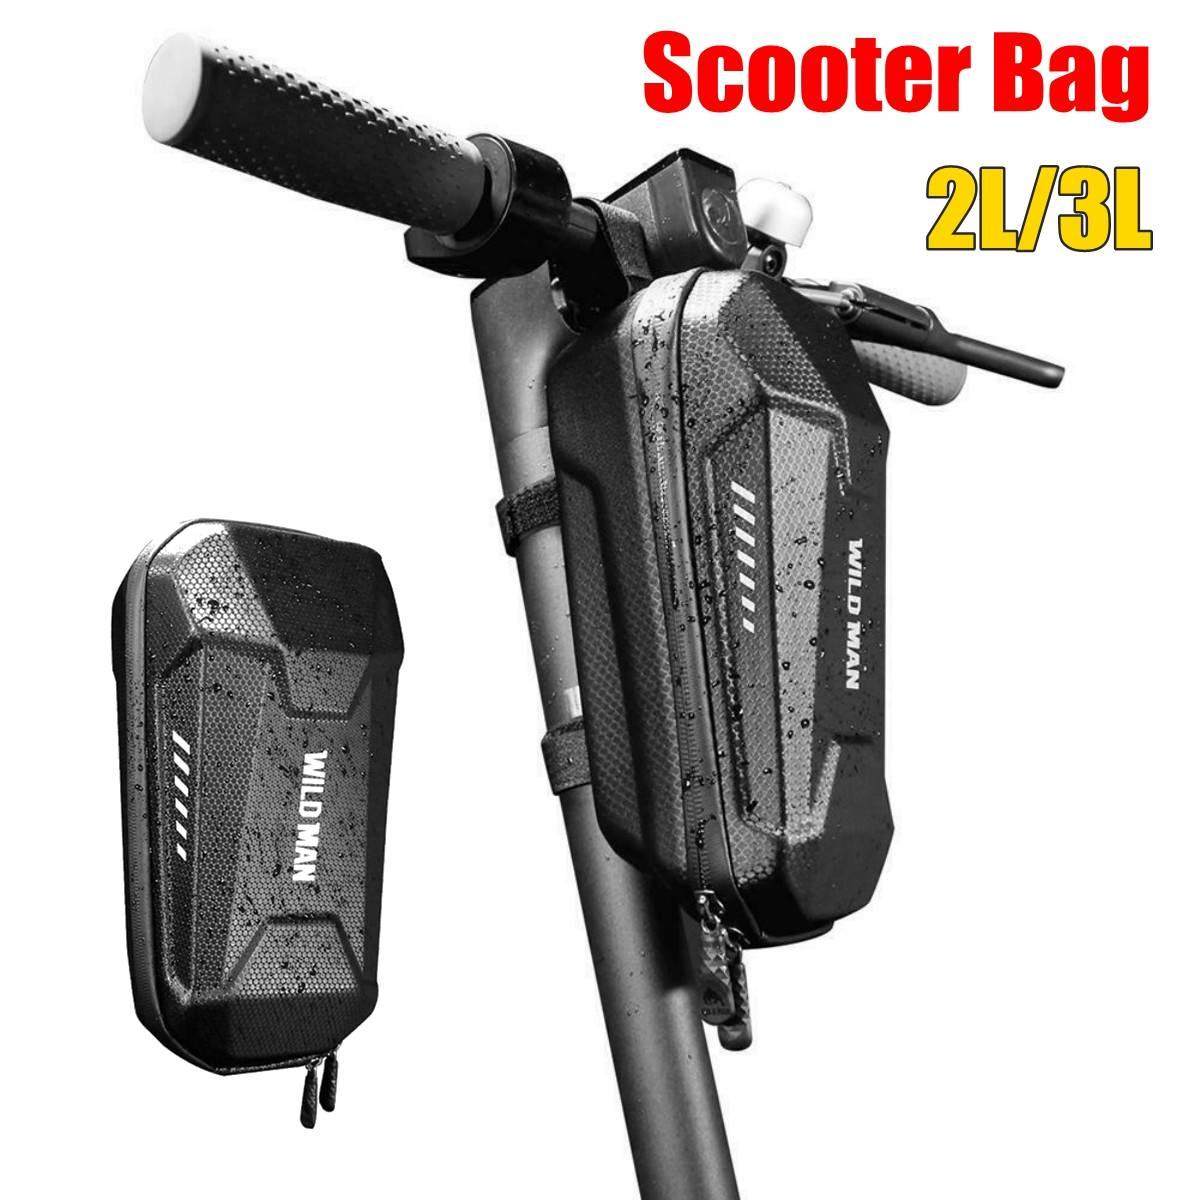 Bolsa para manillar de patinete eléctrico, de 2l/3l, EVA, con carcasa dura para bicicleta plegable Xiaomi M365 ES1 2 3 4